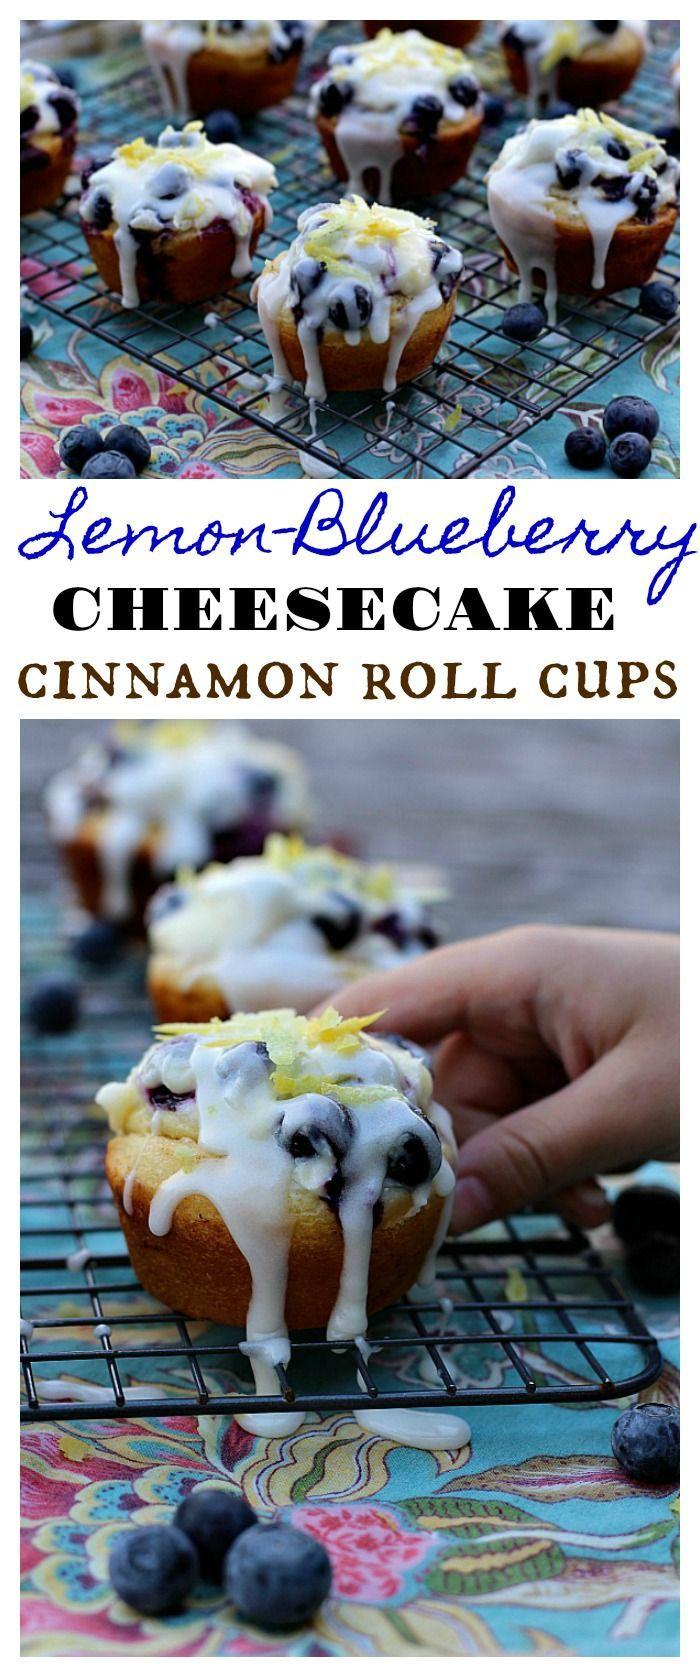 Pillsbury cinnamon rolls with cream cheese icing ingredients